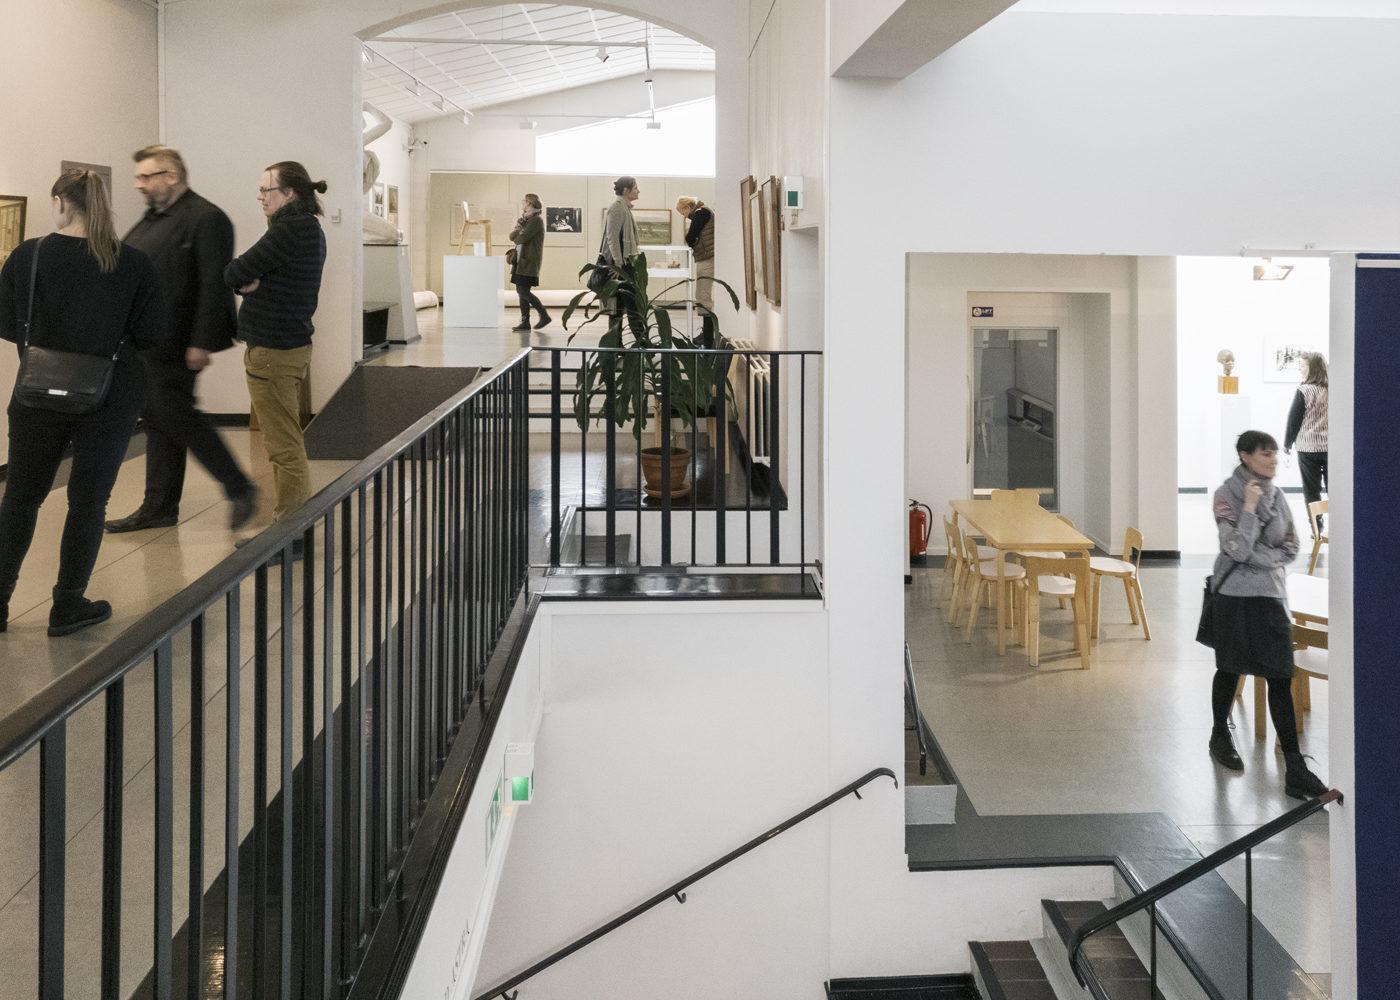 Nelimarkka-museo, Alajärvi